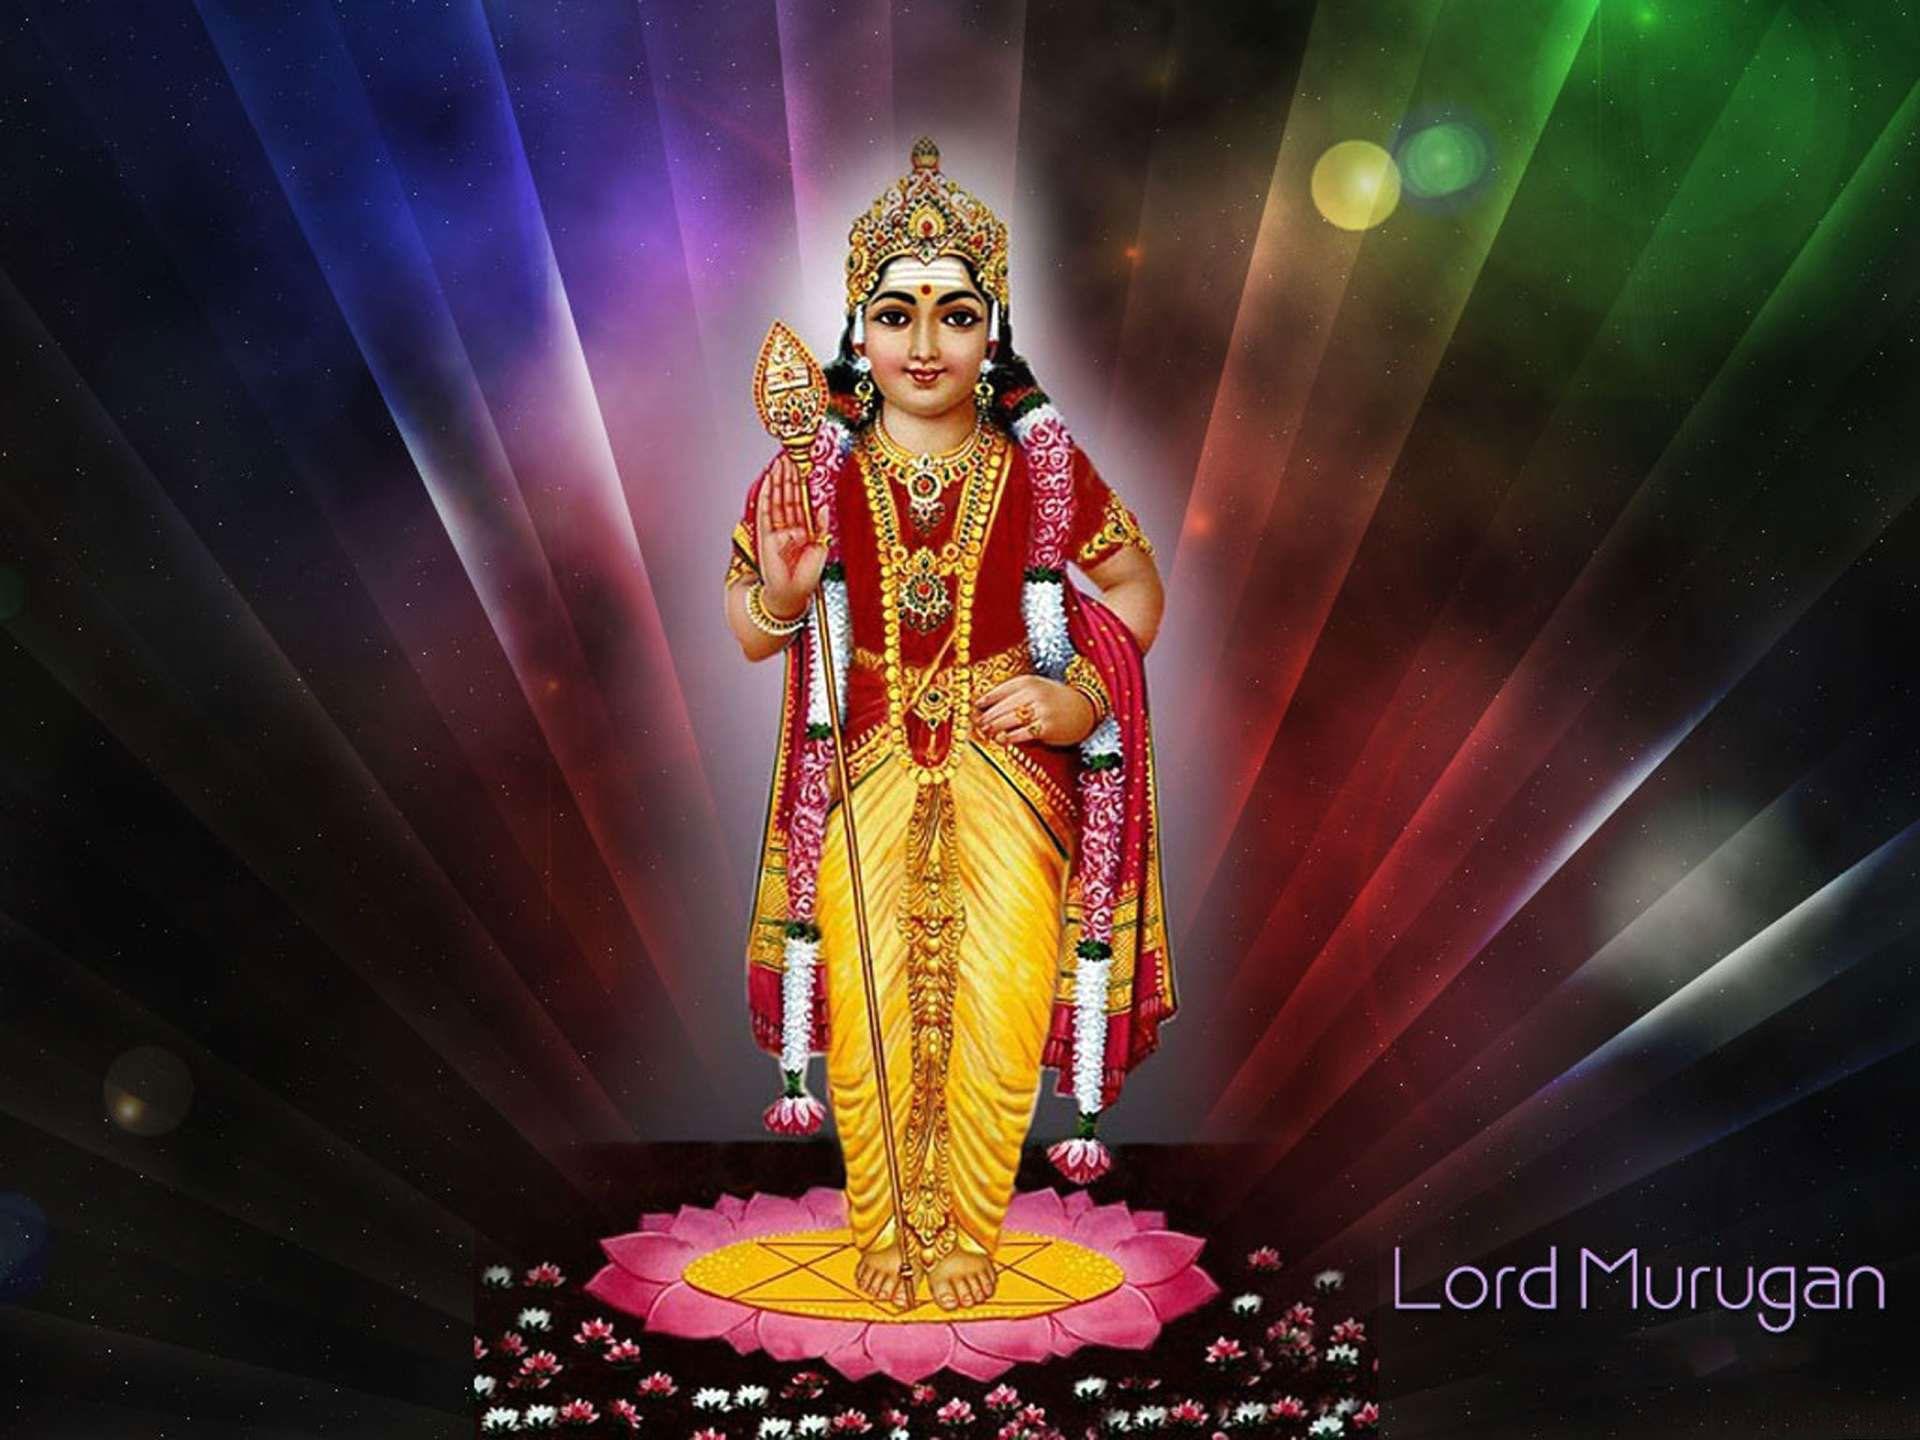 Lord Murugan Wallpapers Photos Images Download Lord Murugan Wallpapers Lord Murugan Lord Shiva Hd Wallpaper